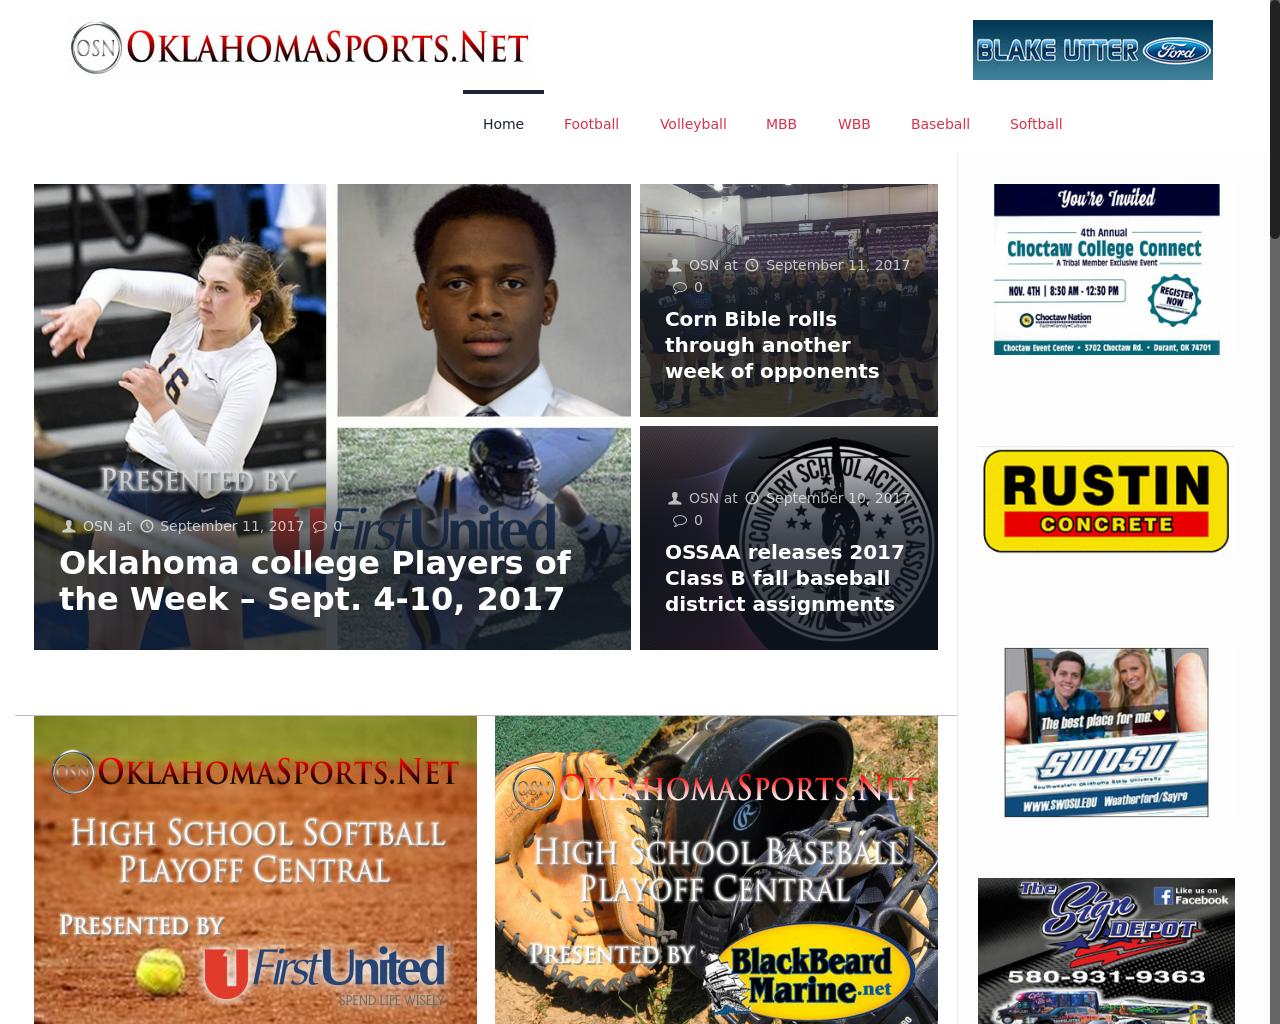 OklahomaSports.Net-Advertising-Reviews-Pricing